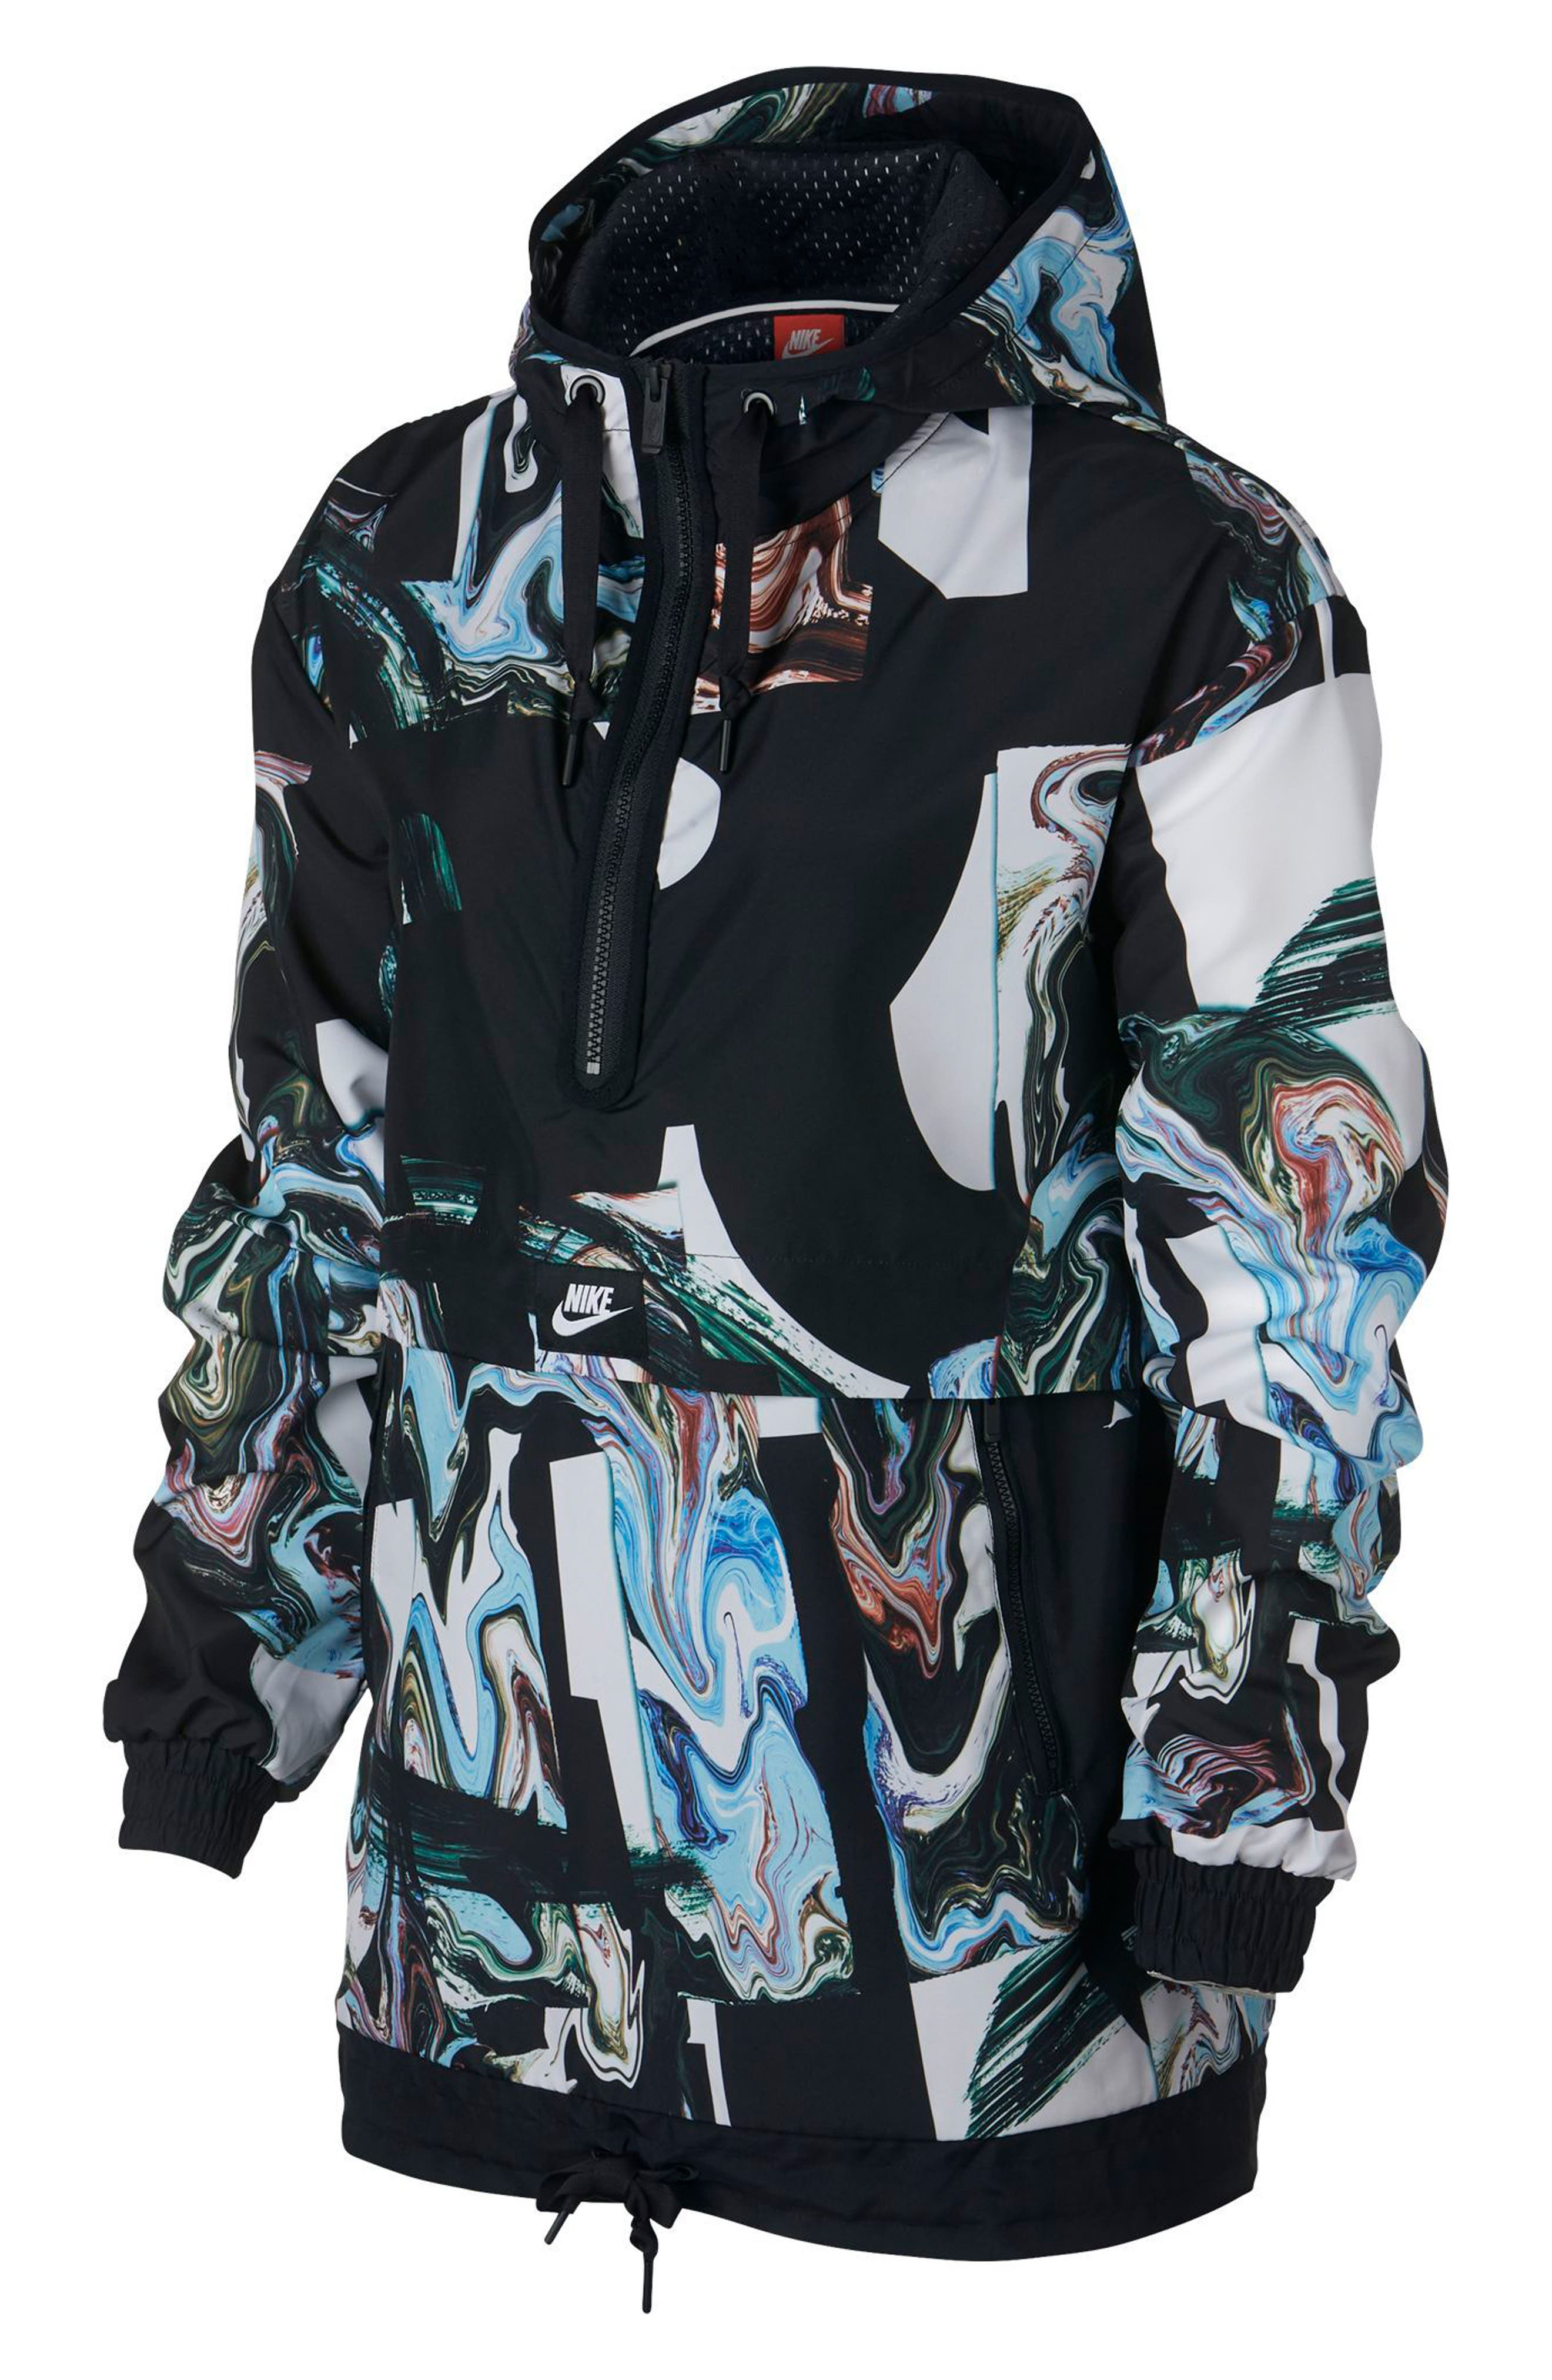 Sportswear Women's Marble Print Hooded Jacket,                         Main,                         color, Black/ Black